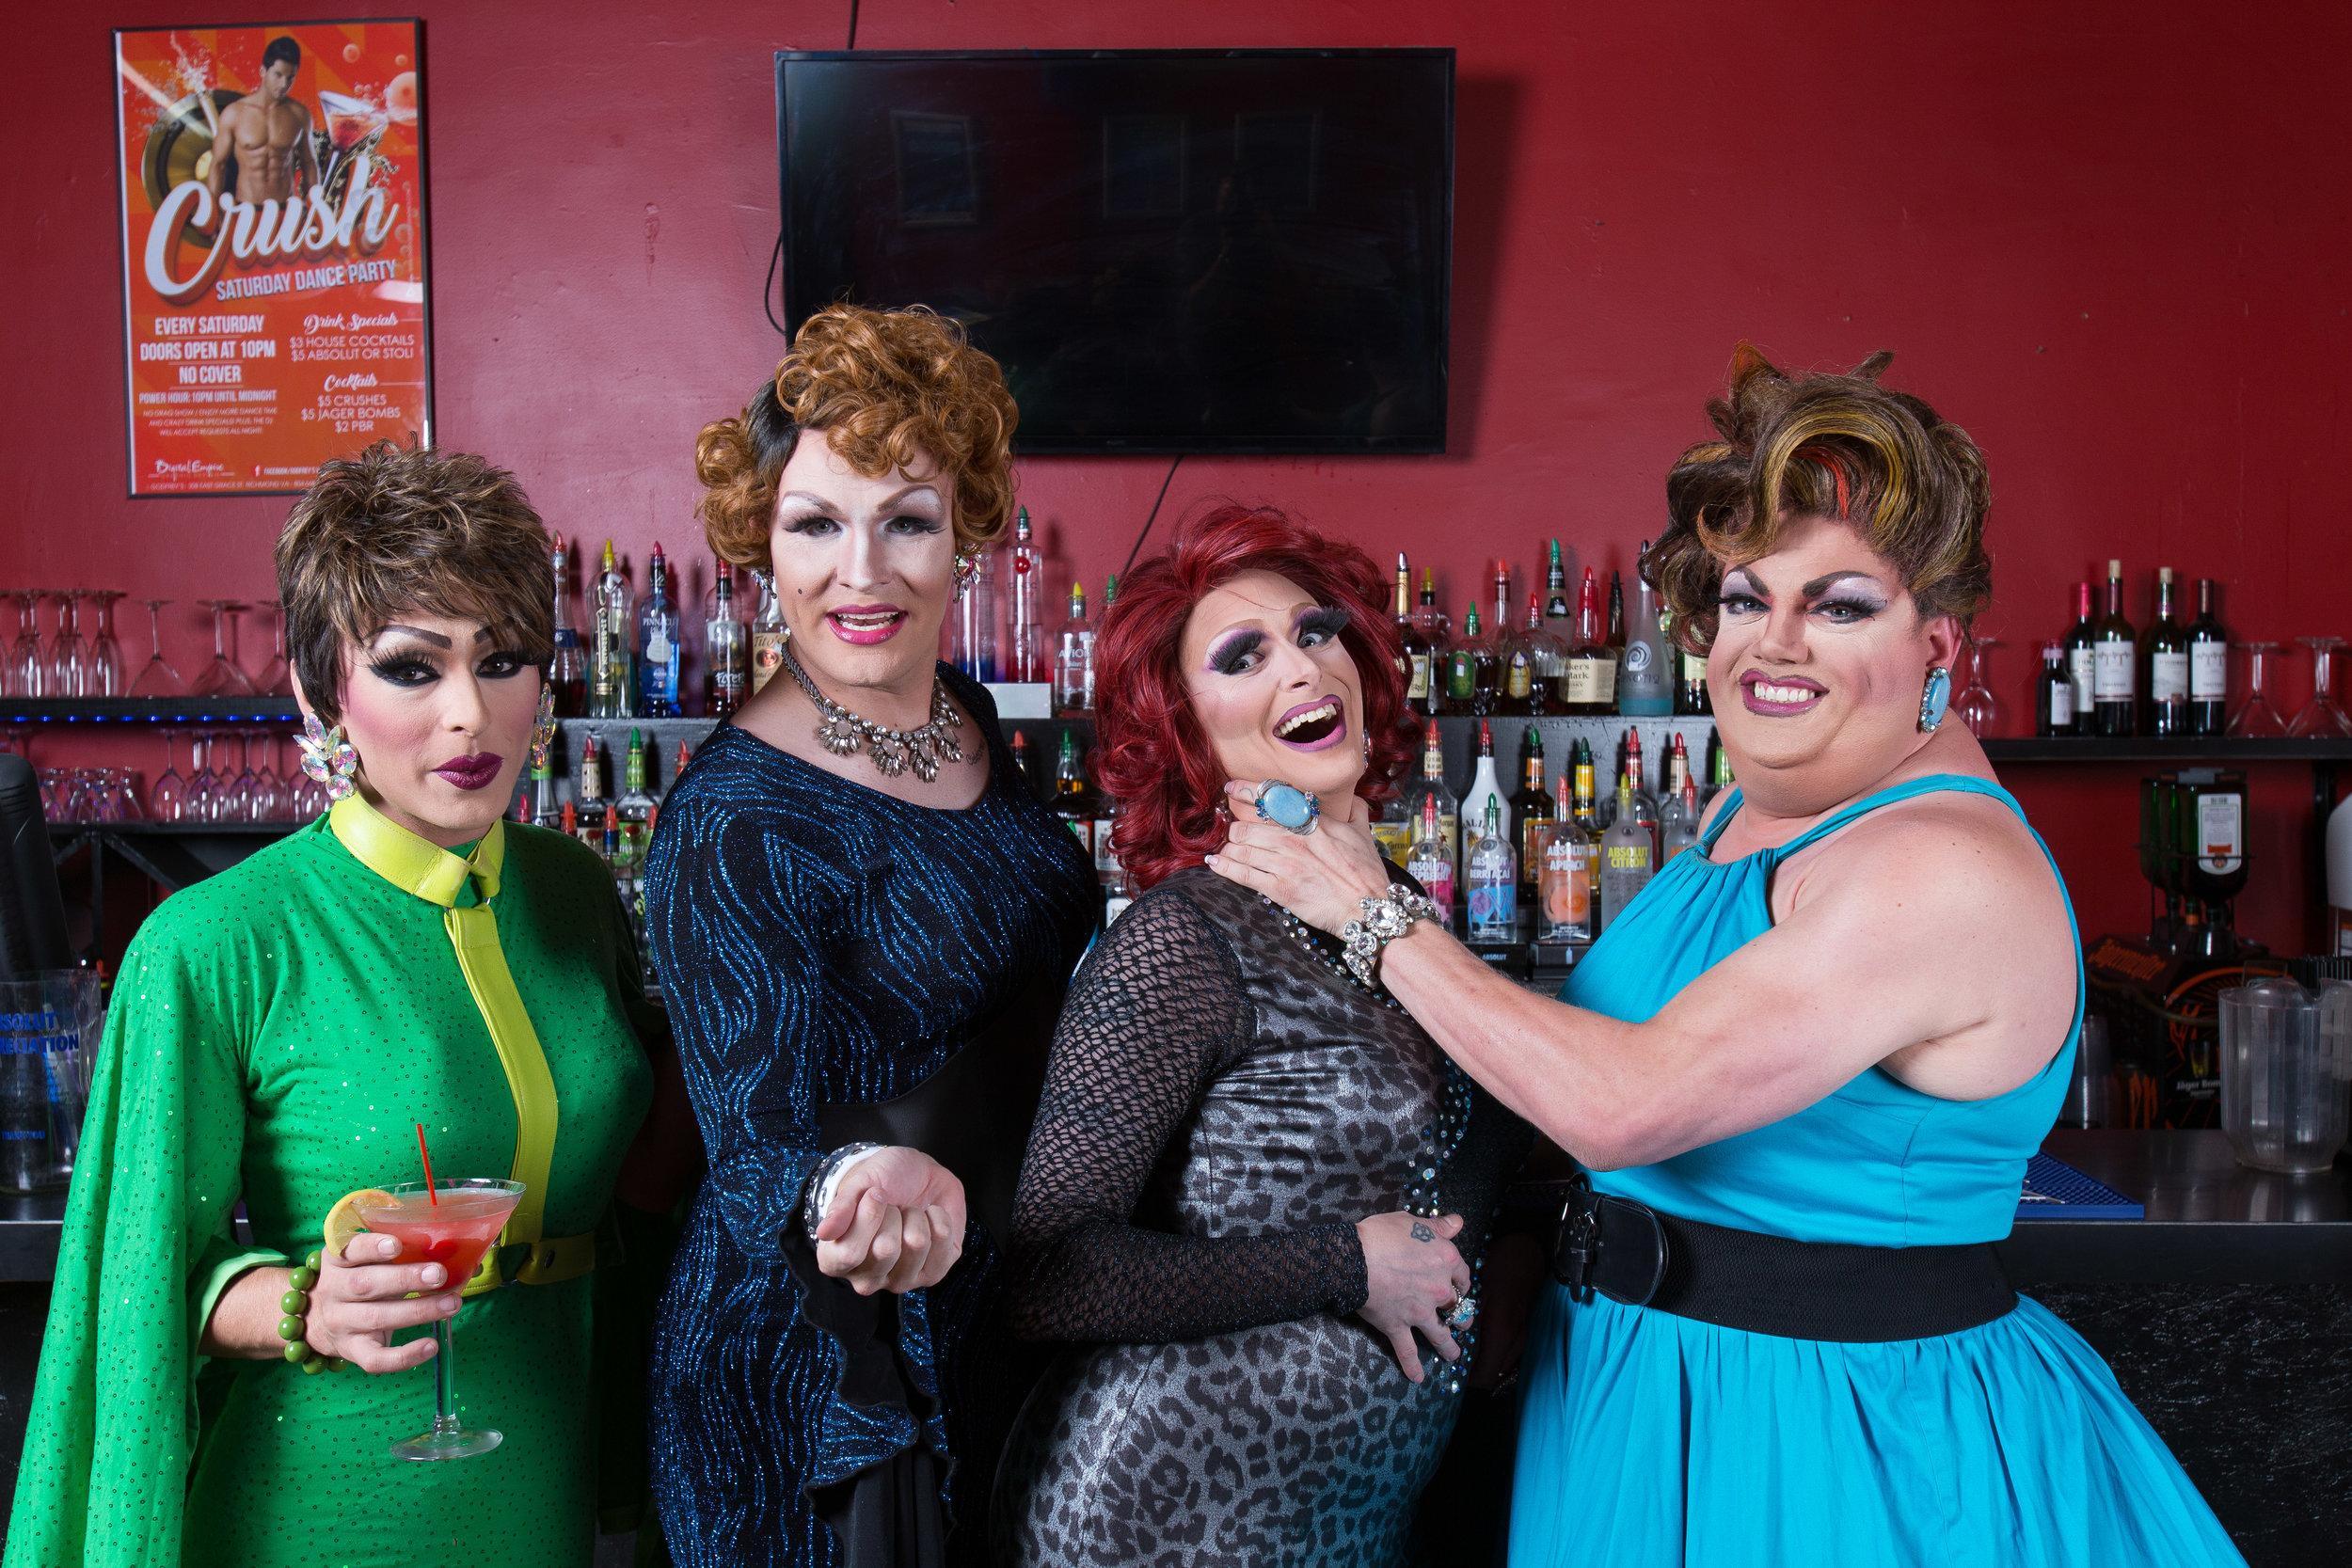 From Left to Right: Michelle Livigne CuzimEdgy, Reann Ballslee, Arianna Carrington, and Natasha Carrington